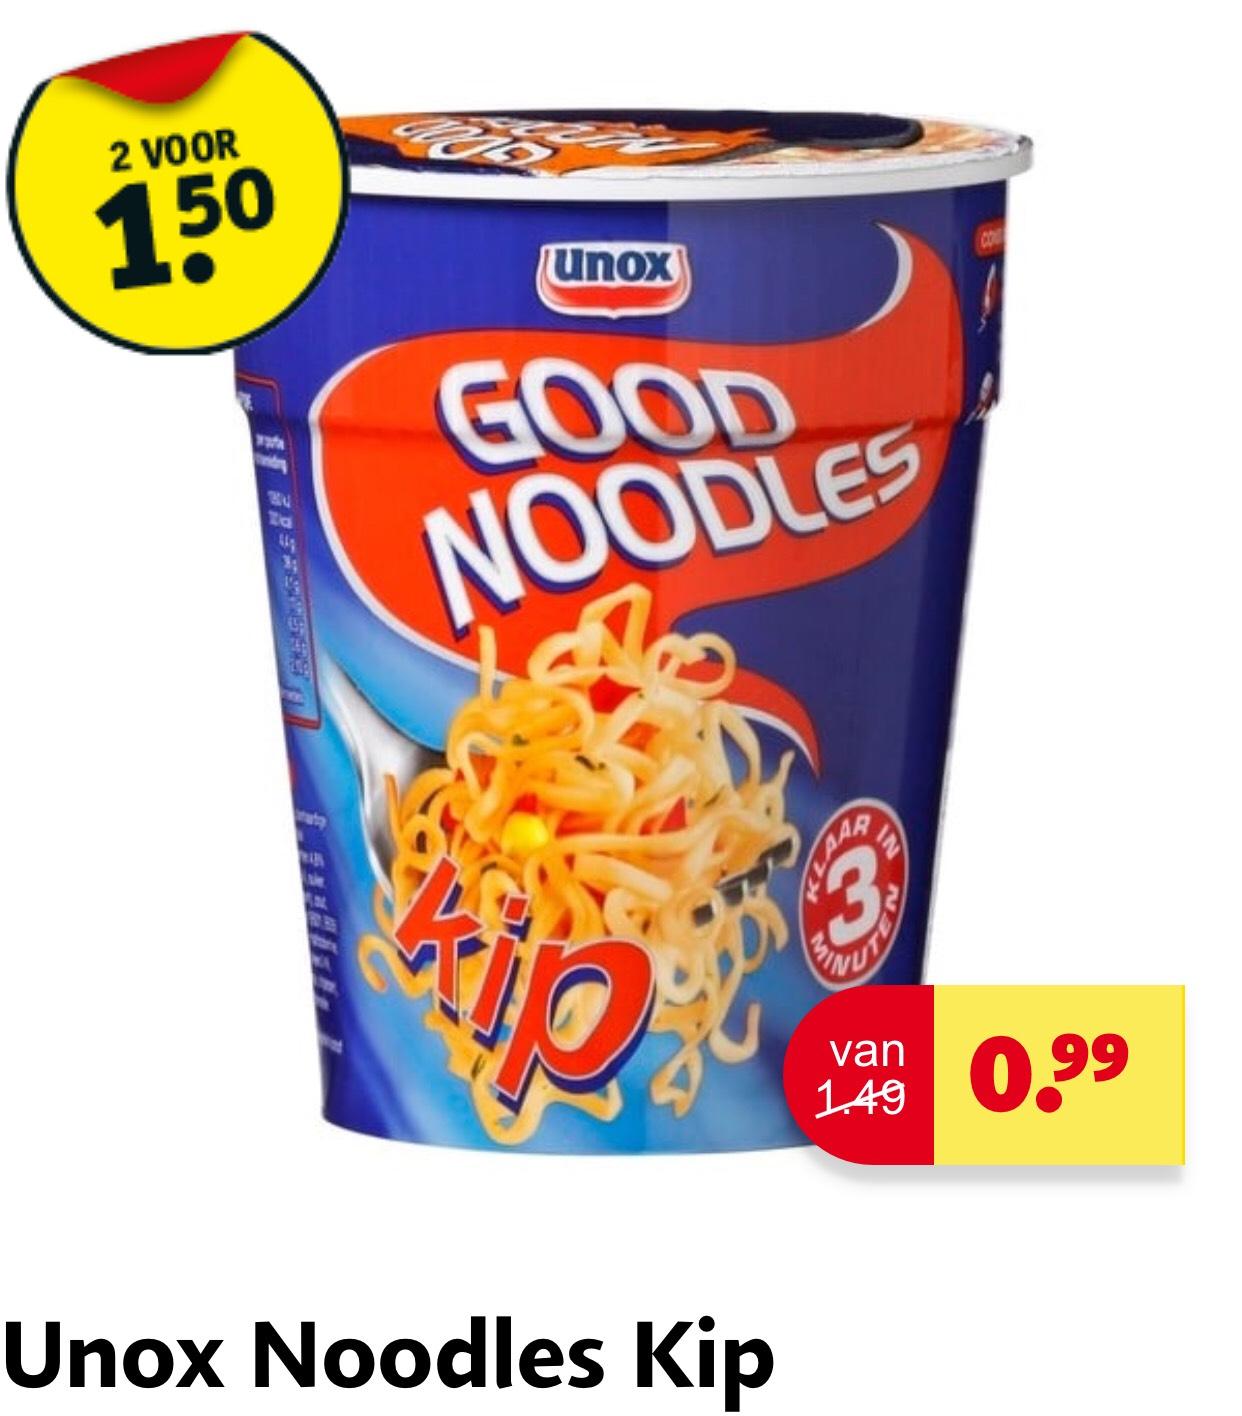 [Kruidvat] Unox Good Noodles kip